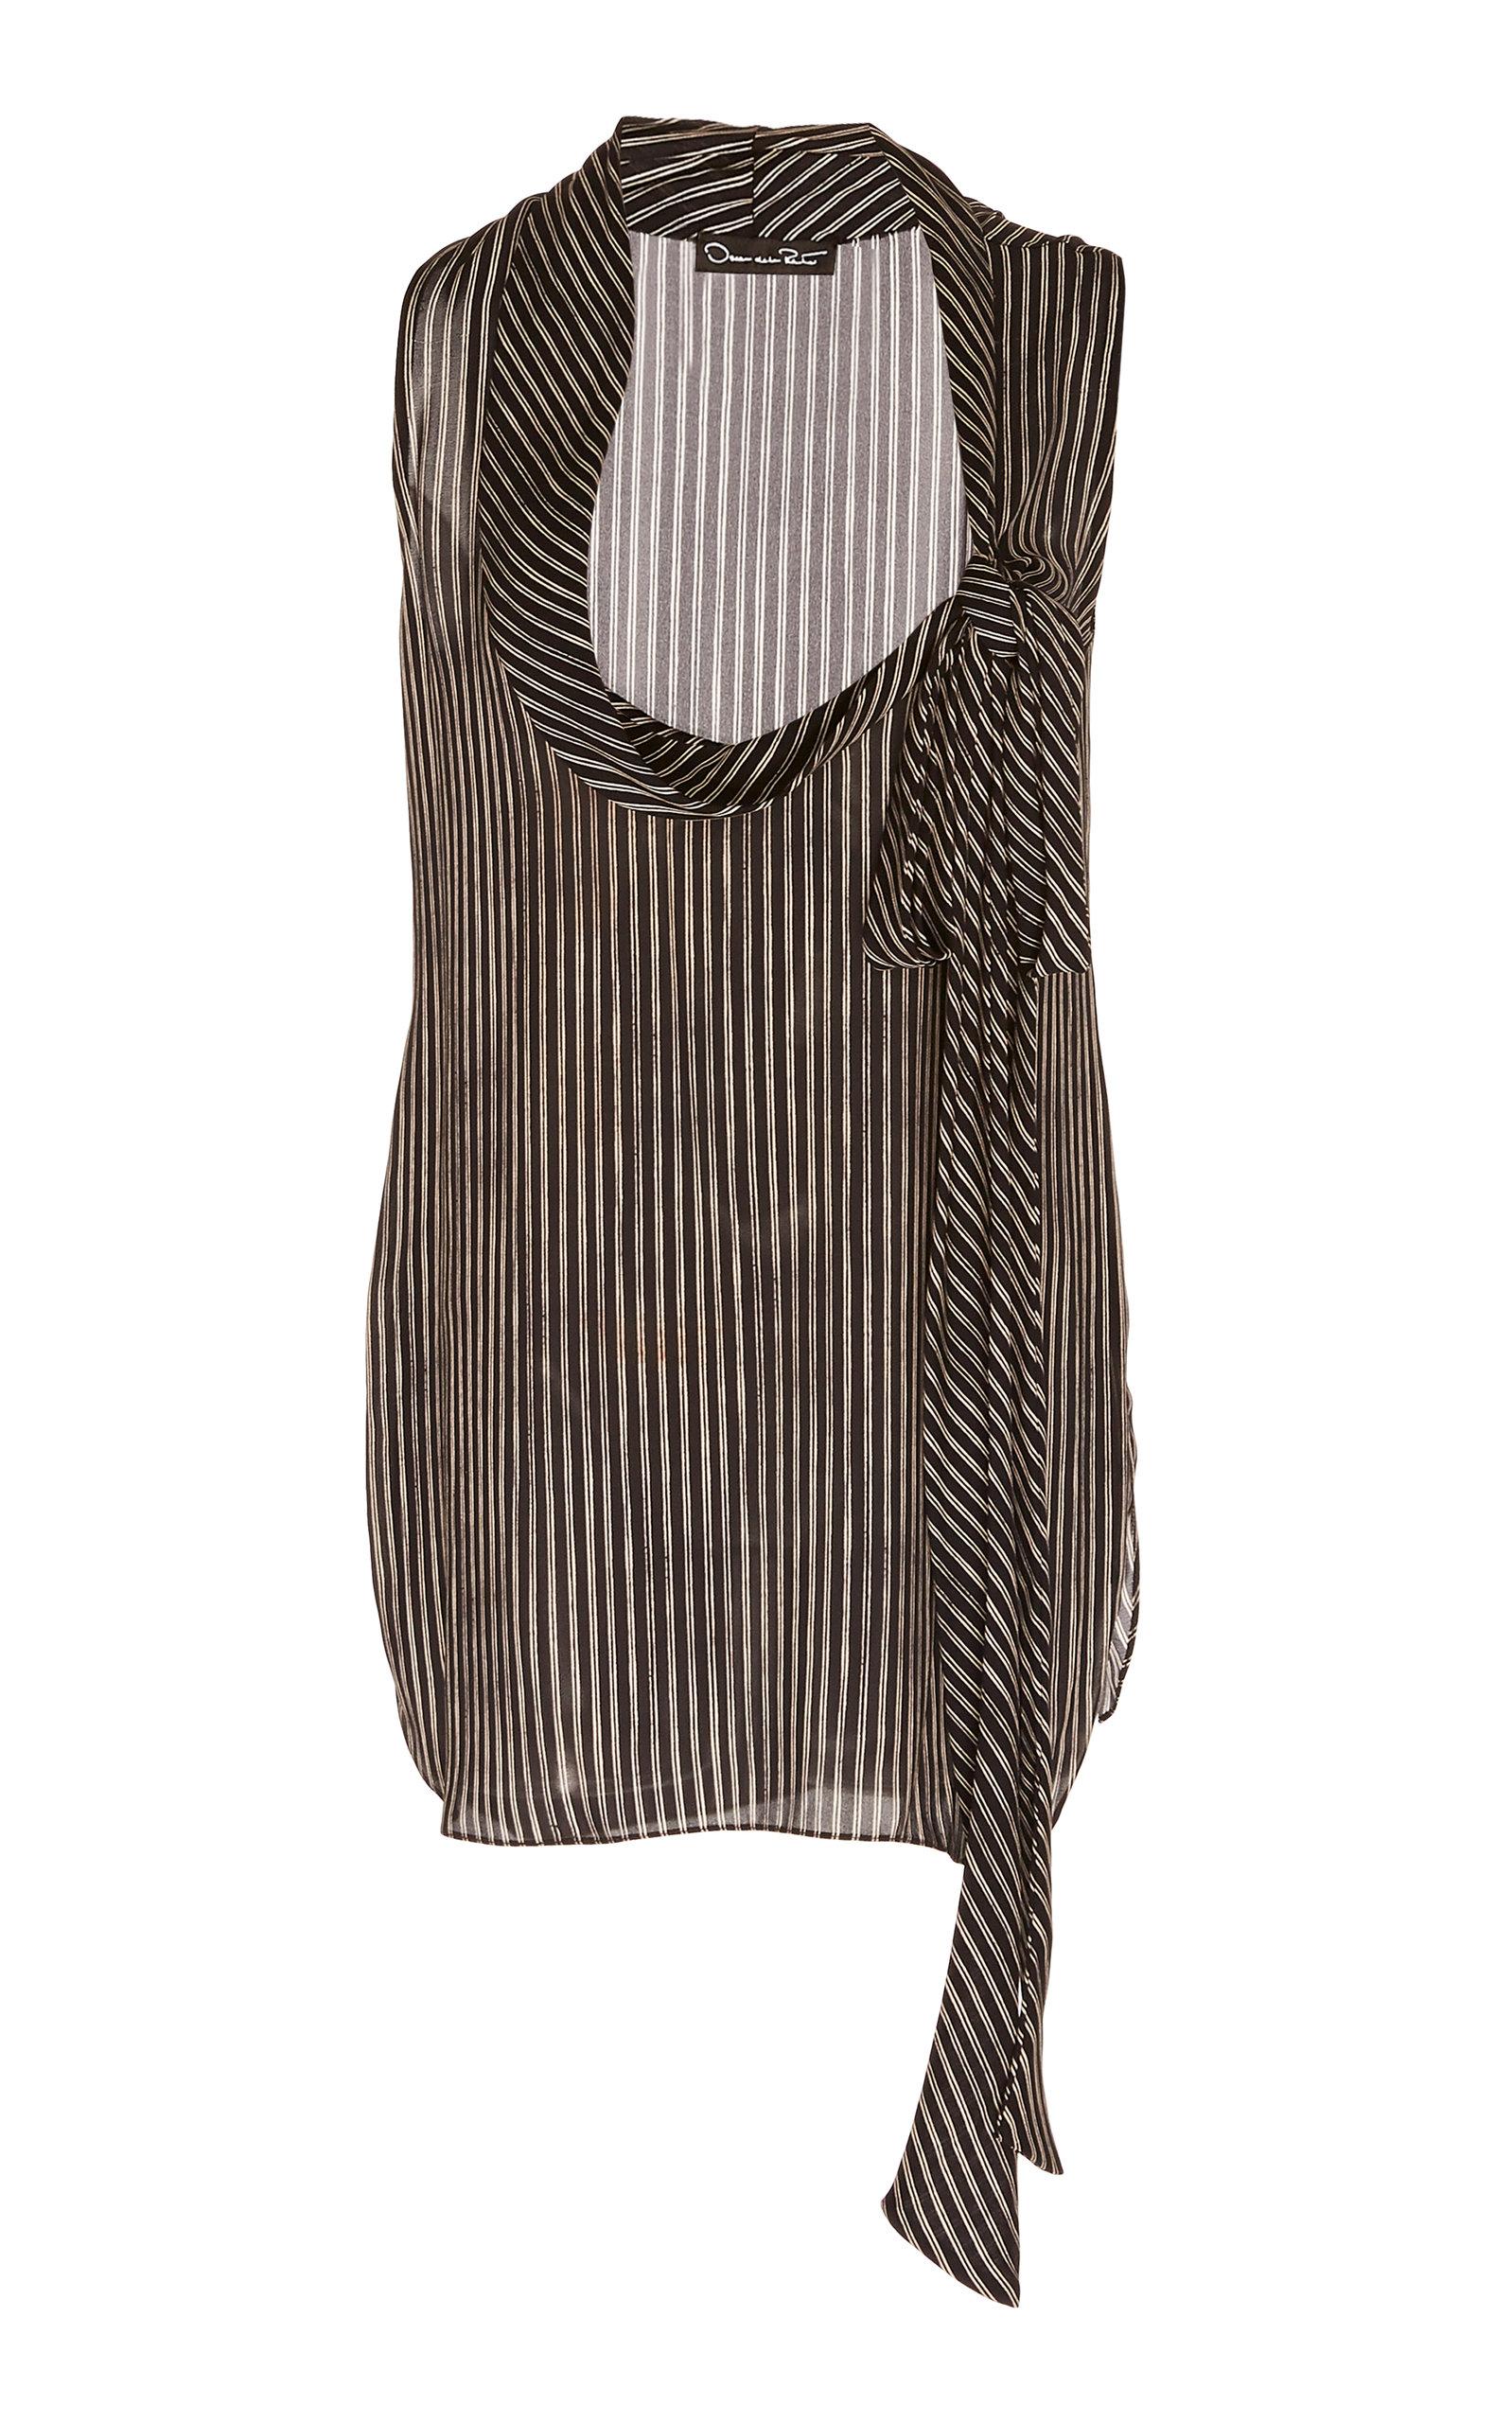 5c9361b37 Striped Silk Sleeveless Blouse by Oscar de la Renta | Moda Operandi